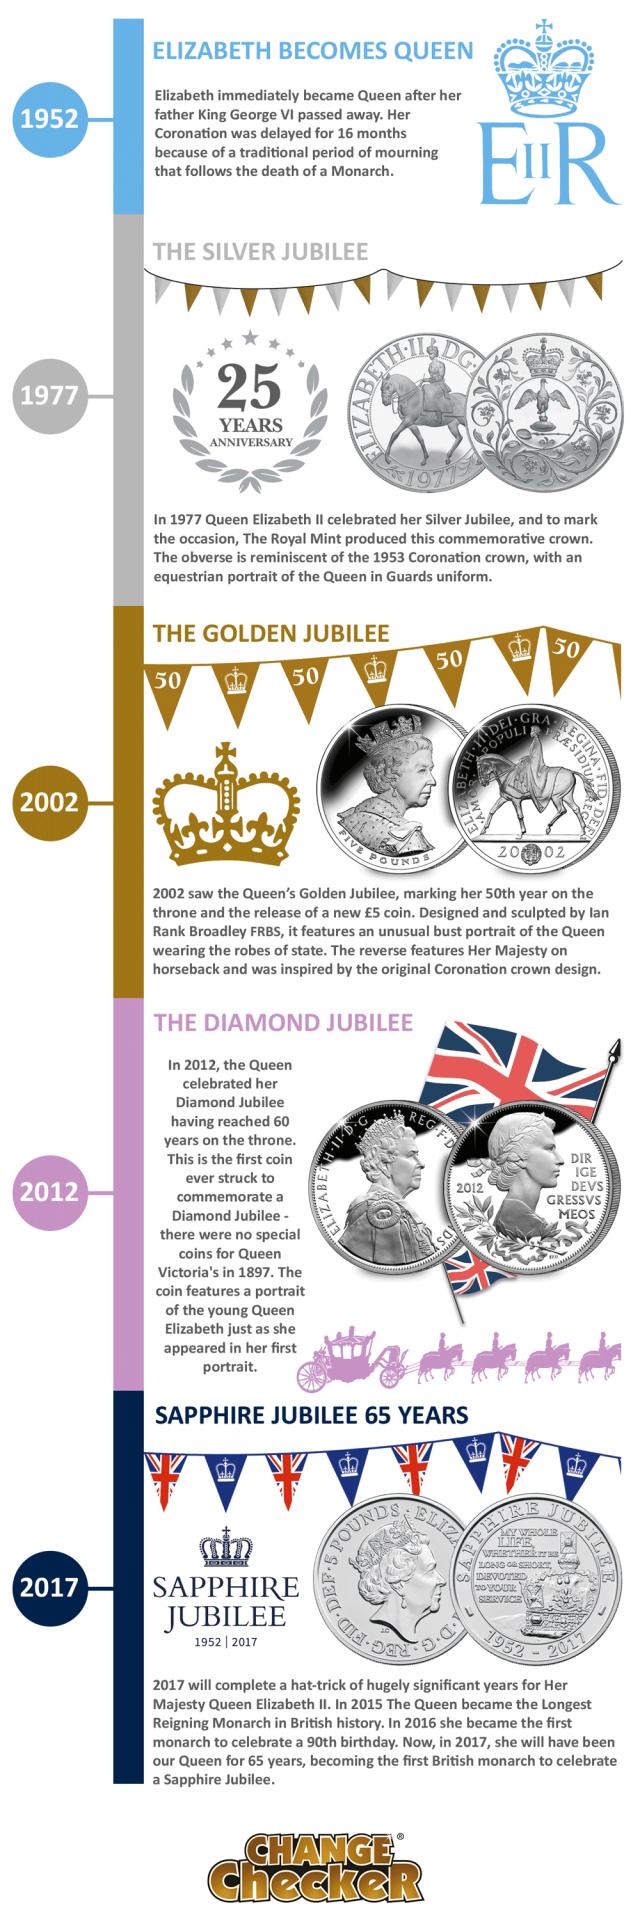 hw-qeii-coronation-shorter-timeline-cc-infographic-final